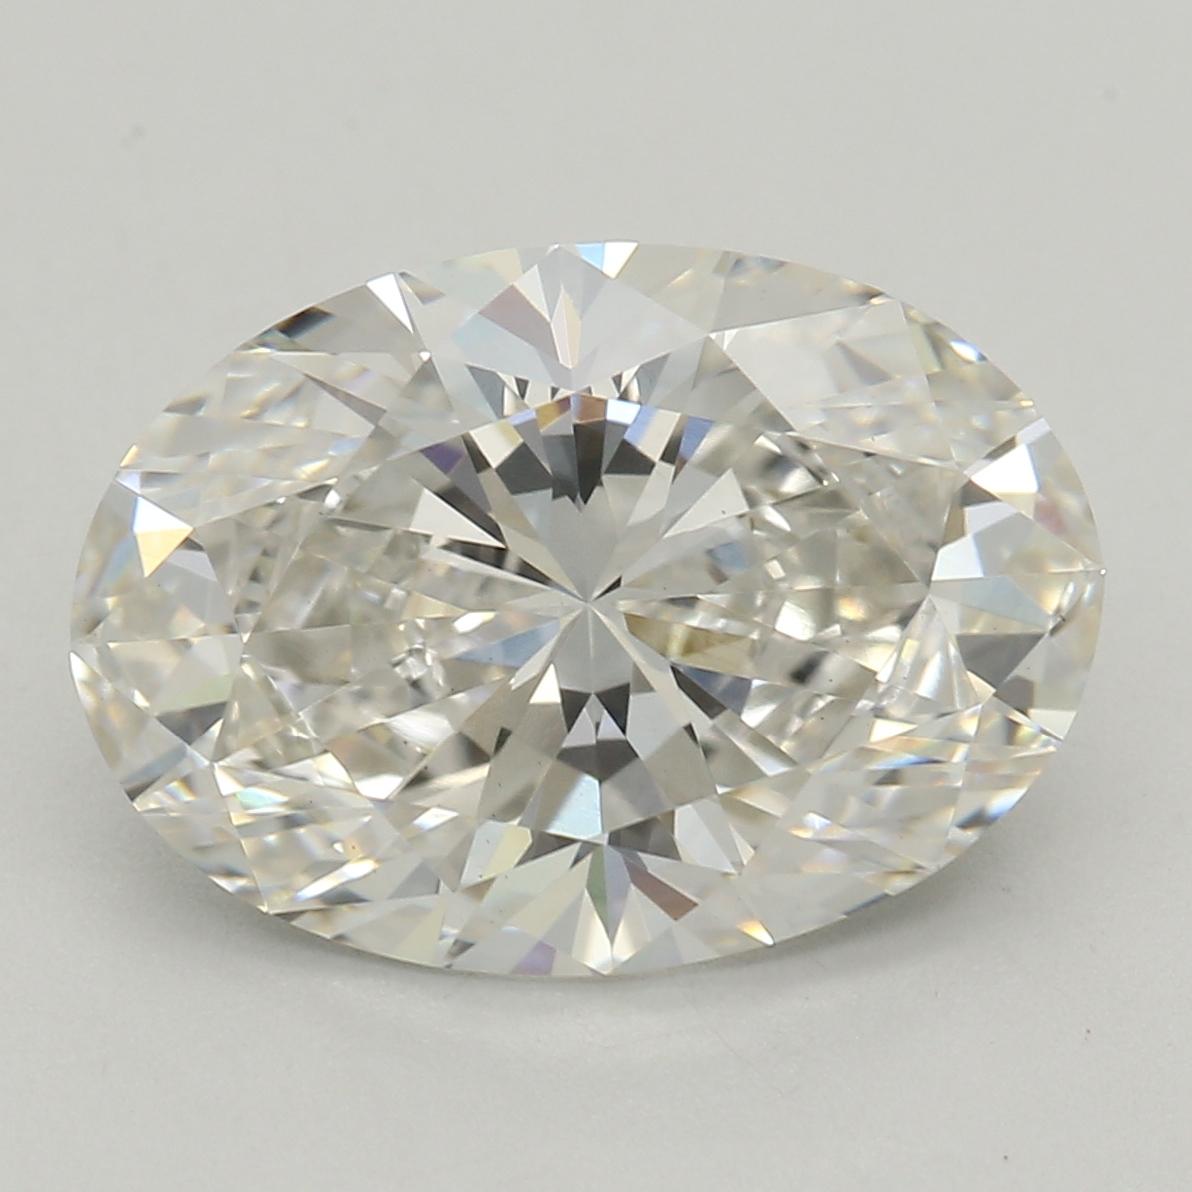 2.36-Carat Lab Created Ideally Cut Oval Diamond